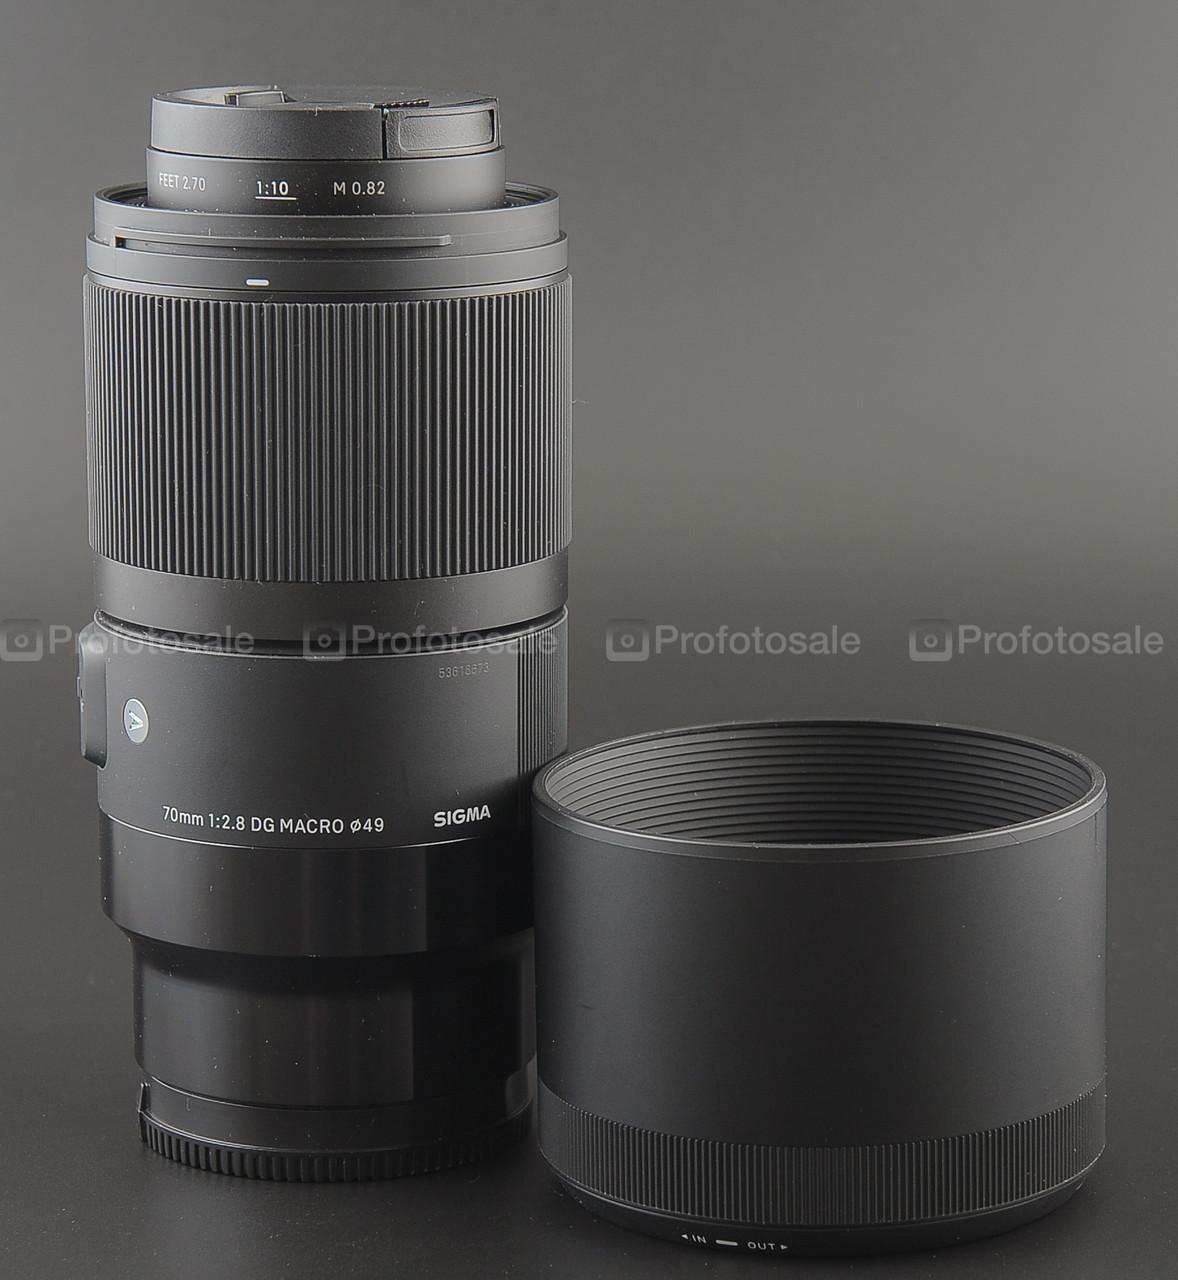 Sigma ART 70mm f2.8 DG macro Sony FE